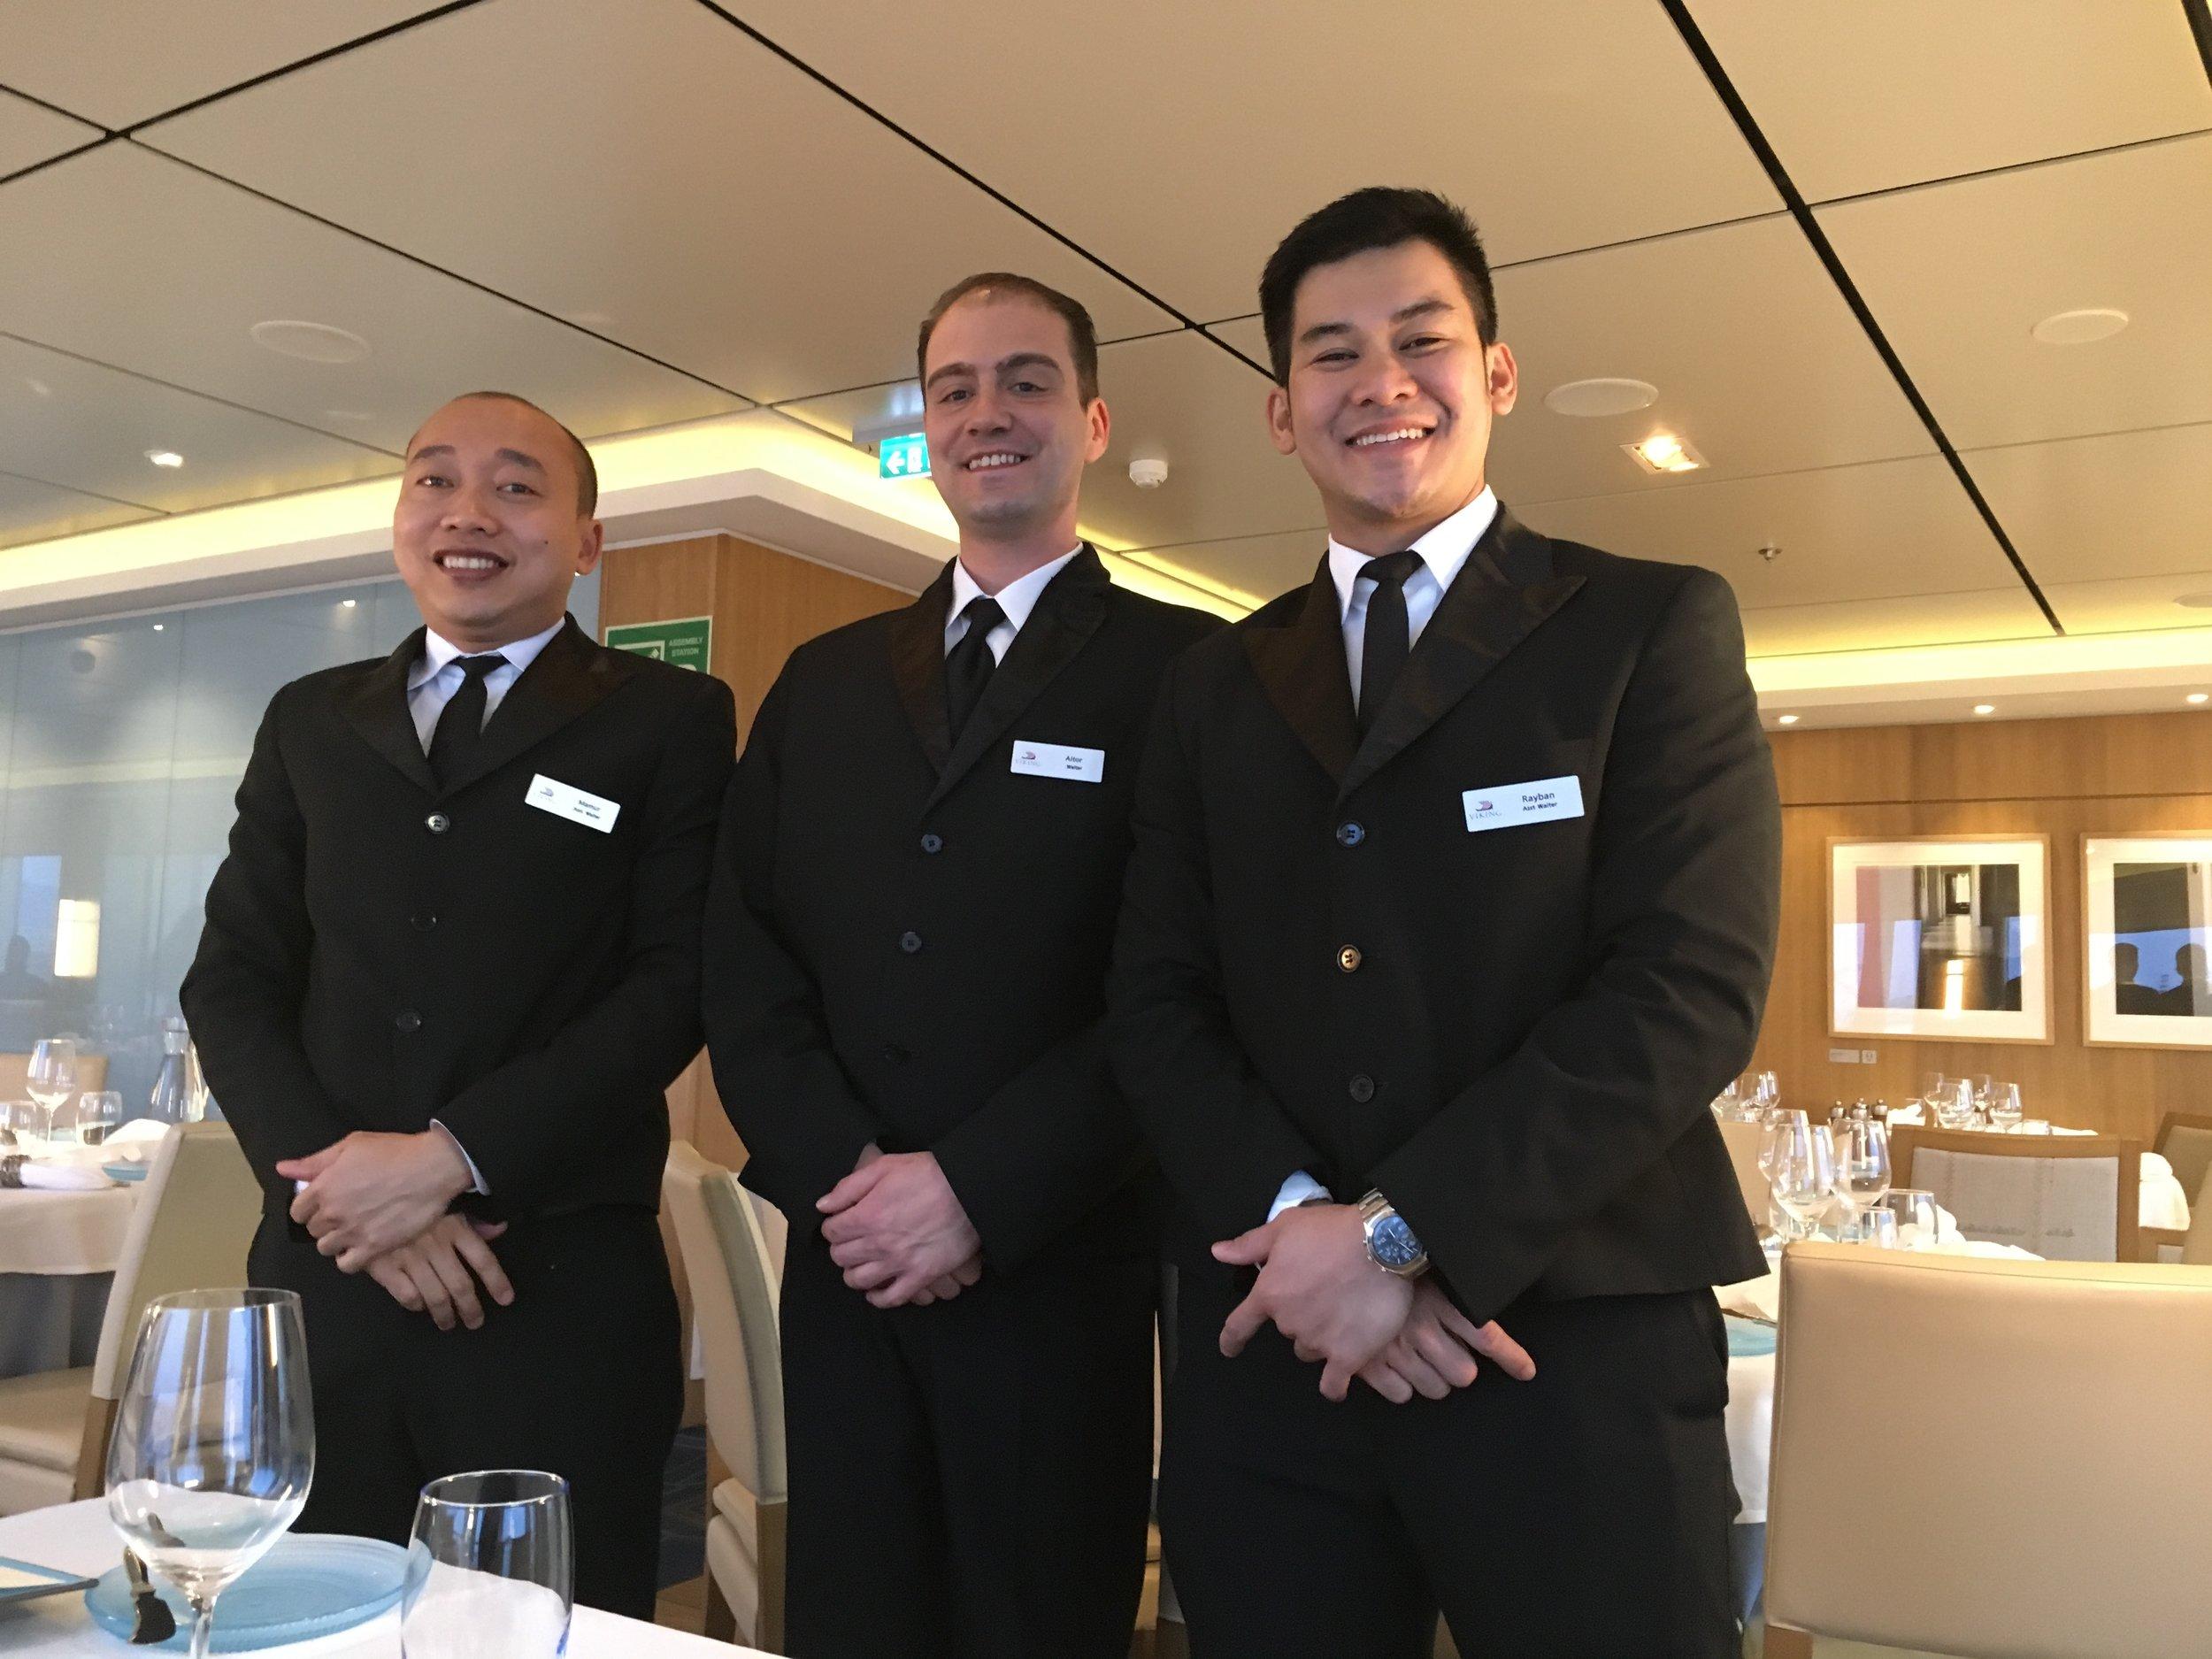 The best waitstaff at sea